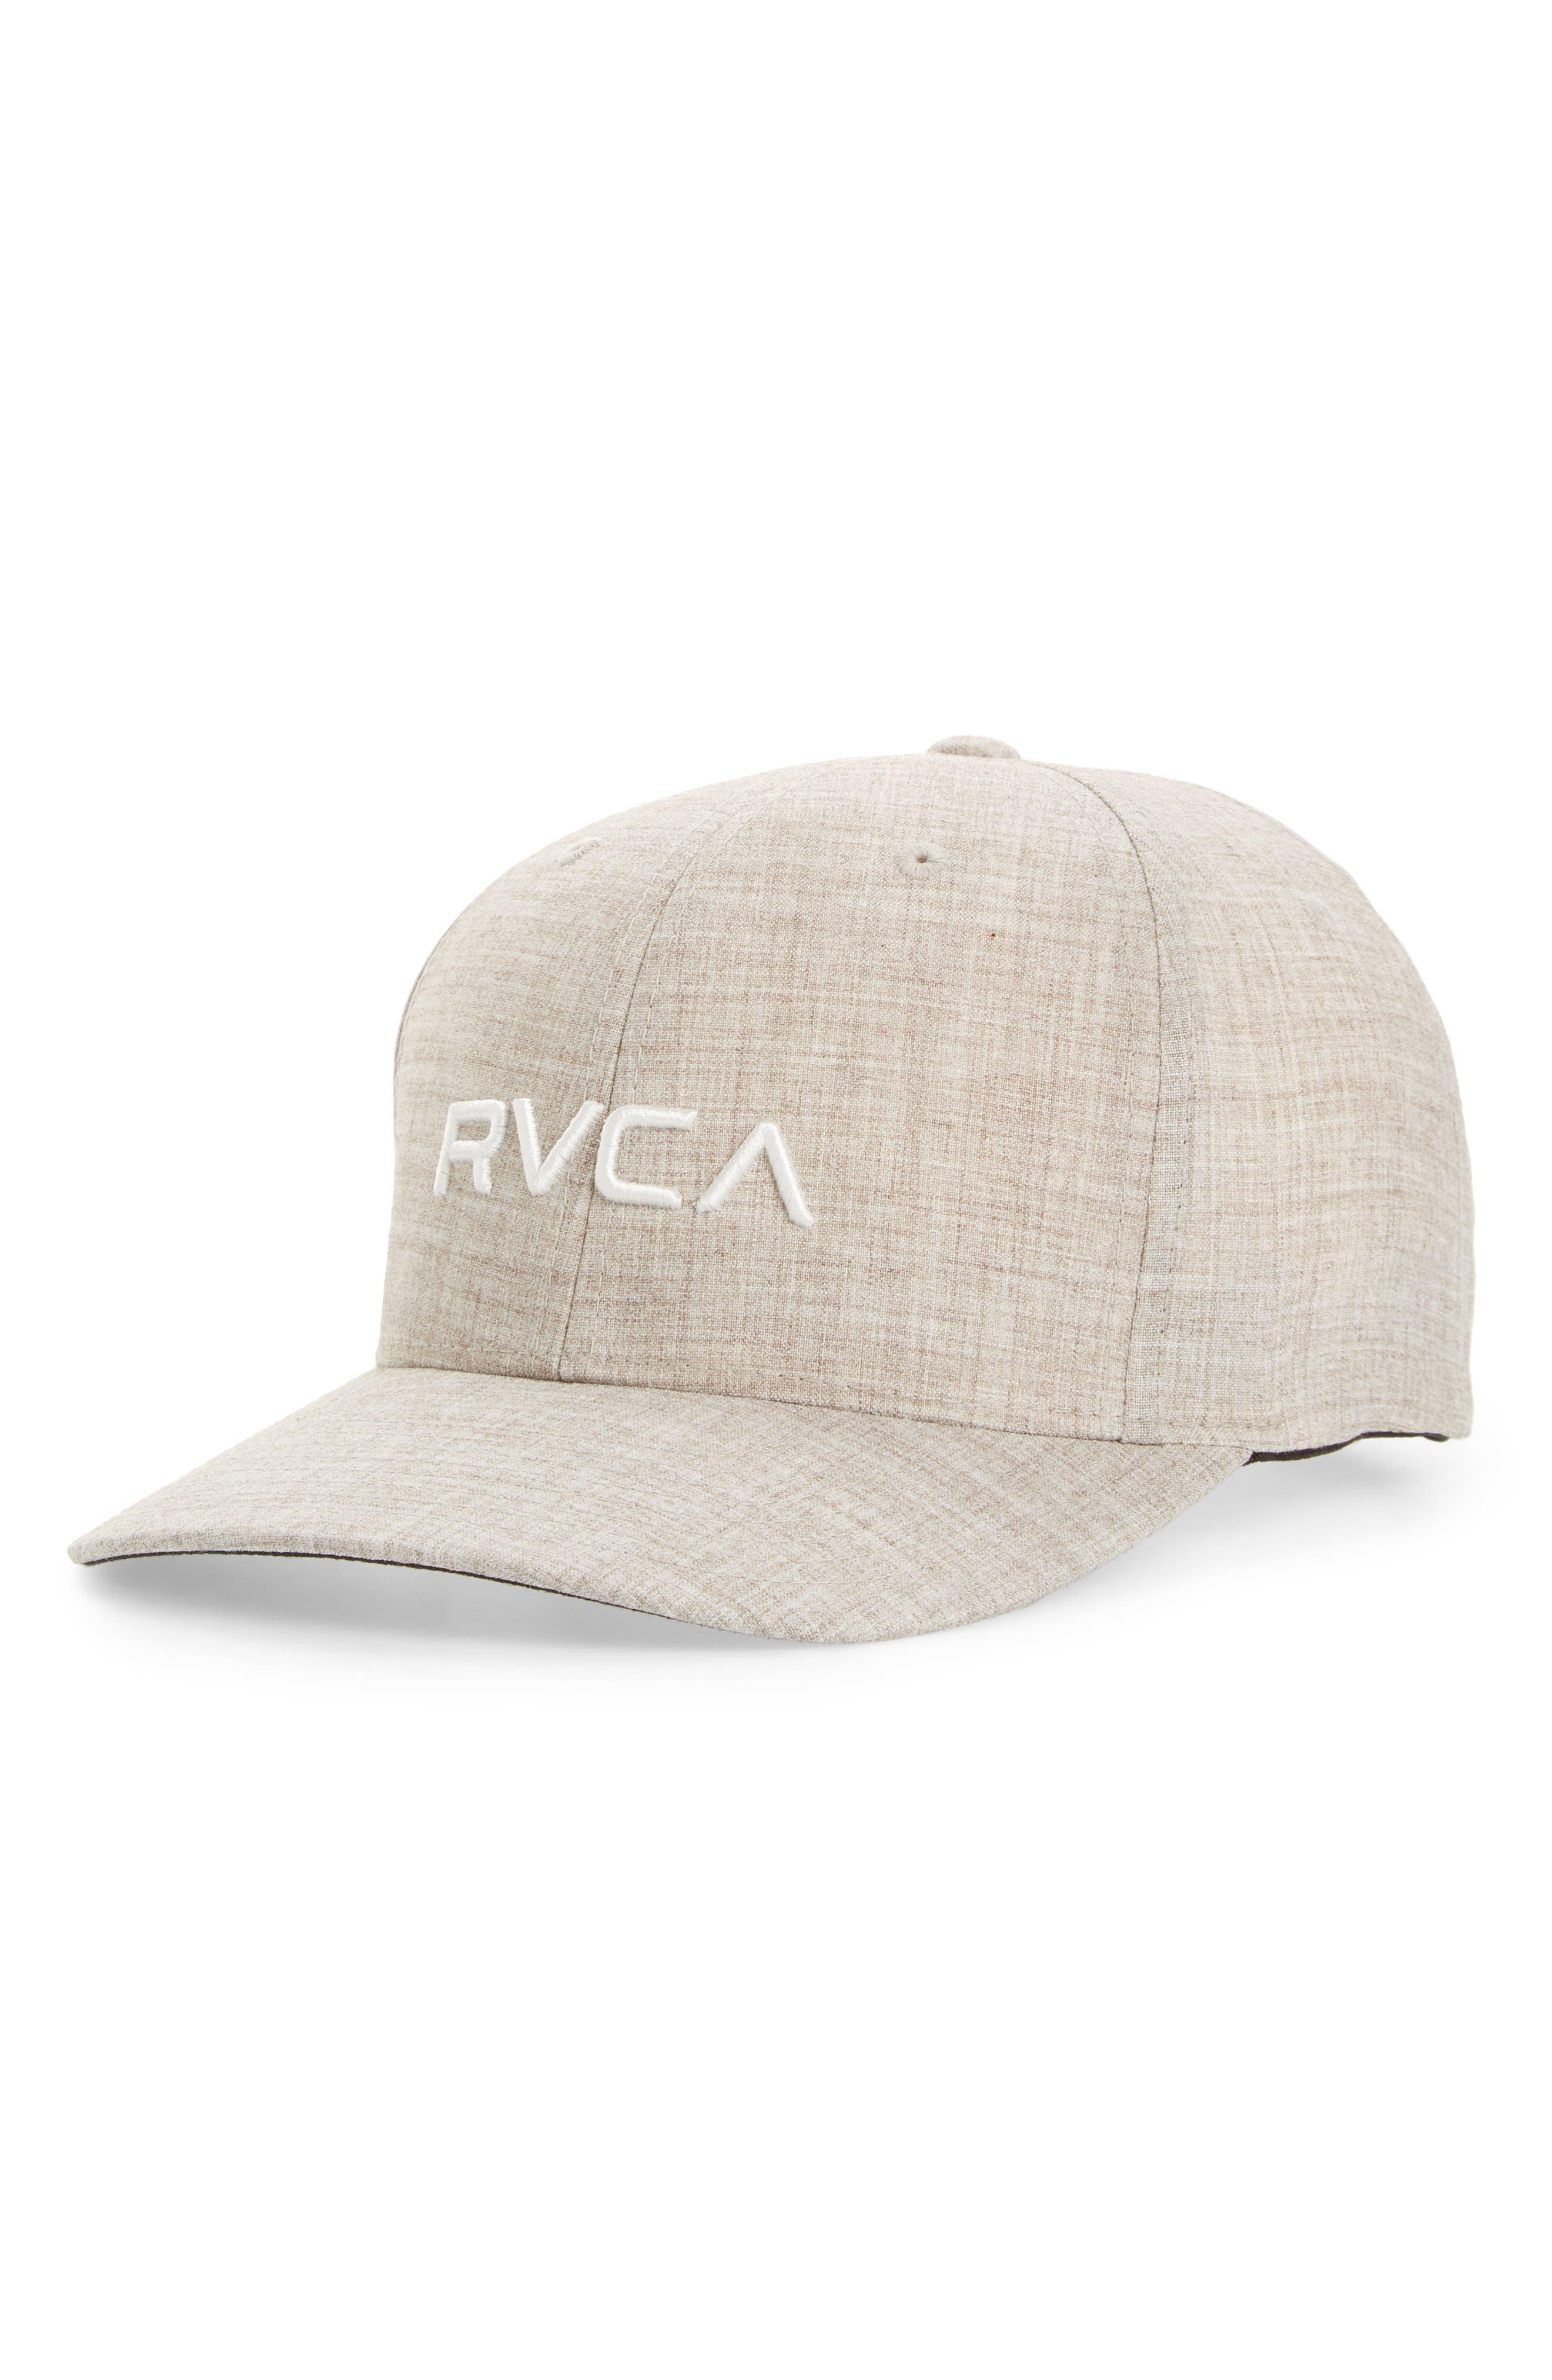 purchase cheap b3aa4 11d25 where to buy rvca womens grill dad hat denim 257c6 2534e  50% off rvca flex  fit baseball cap 7f70c 09318